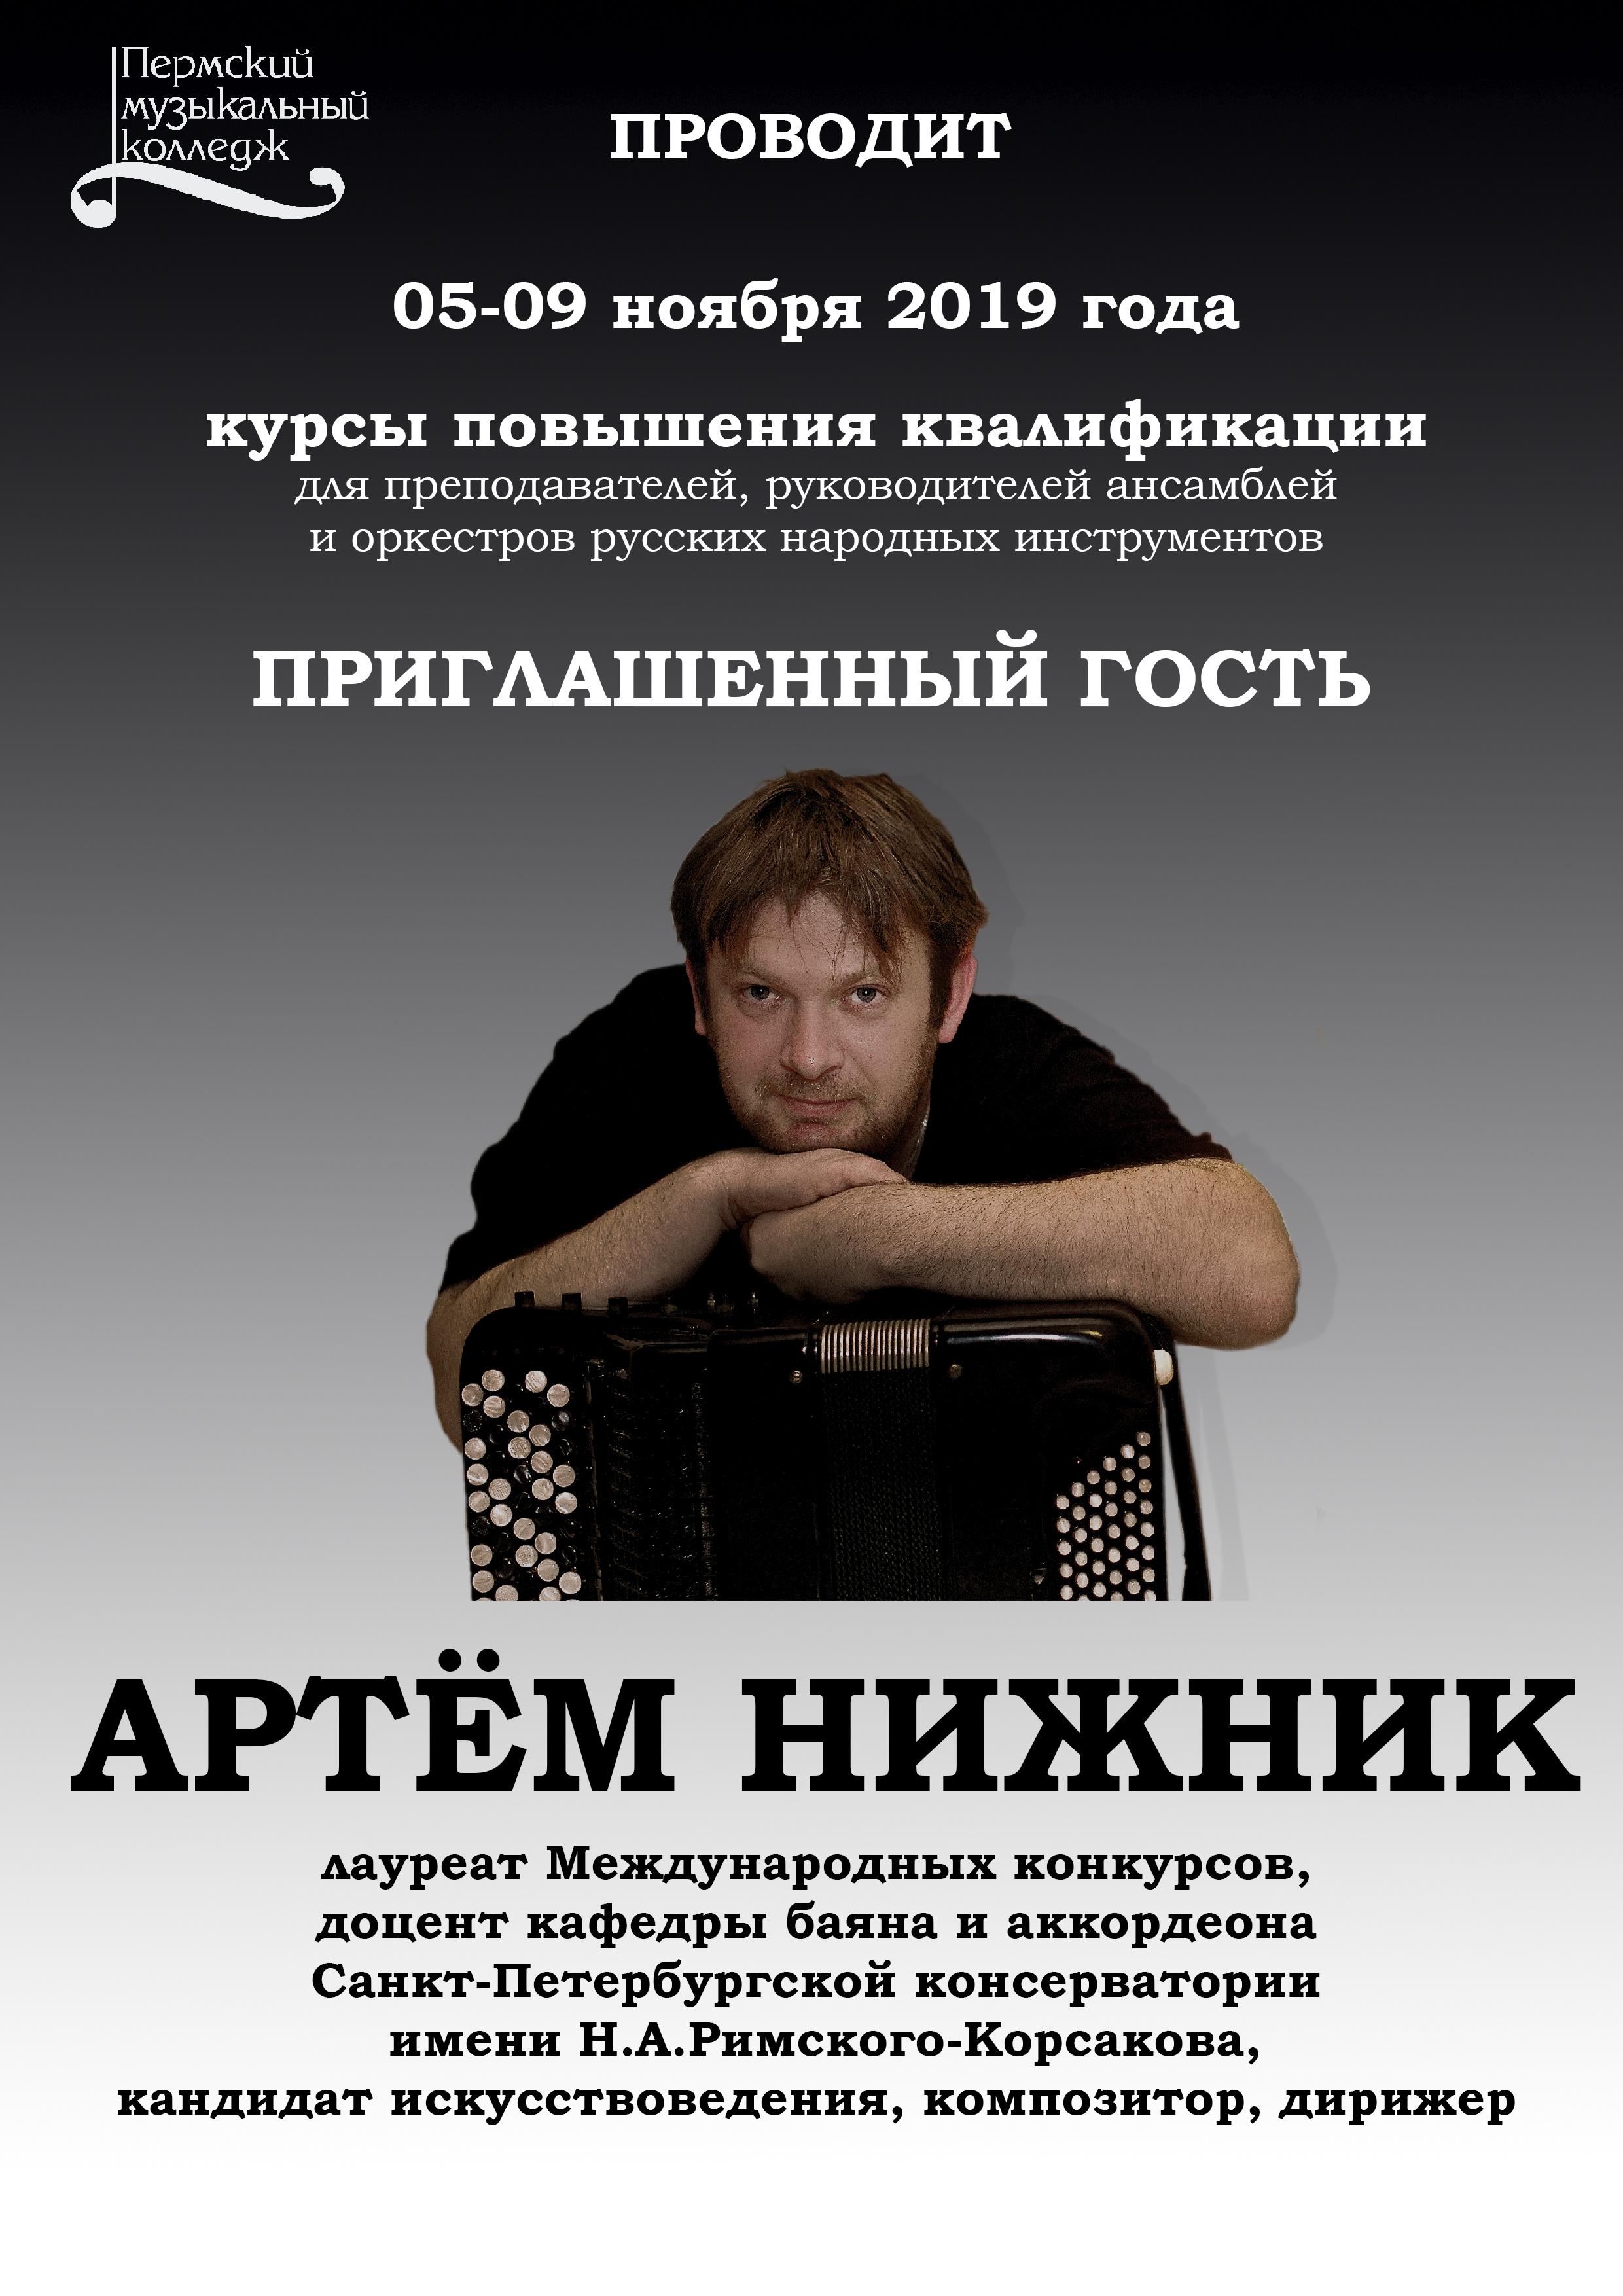 Афиша-Нижник-АС